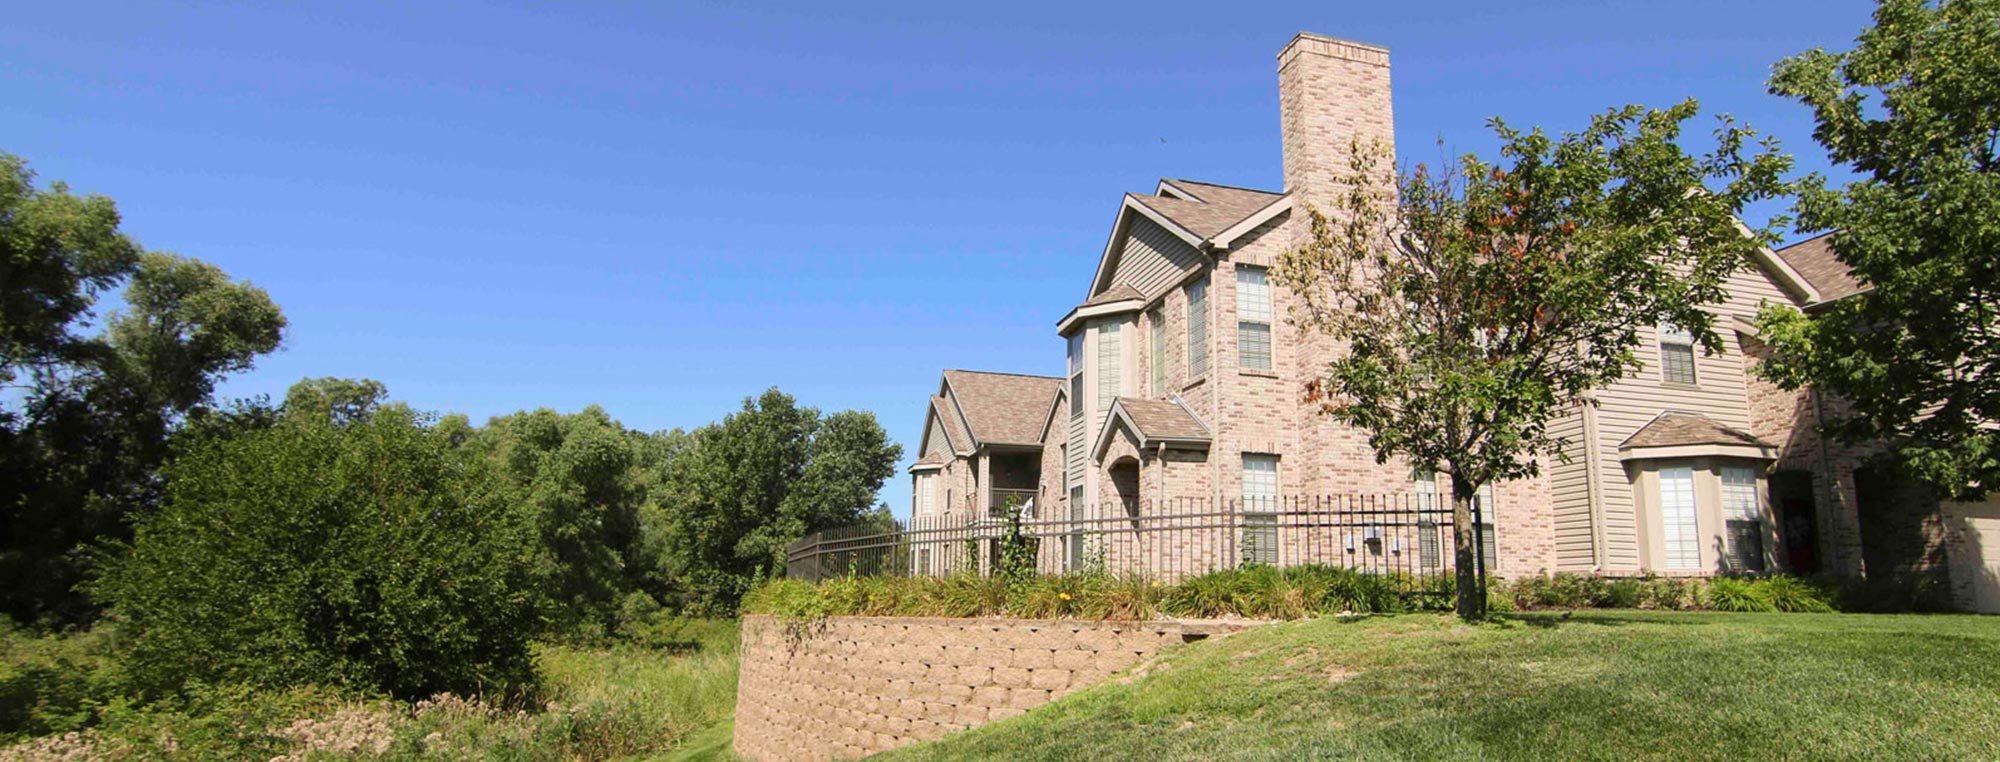 Stone Creek Villas 1 2 3 Bedroom Townhomes For Rent In Omaha Ne